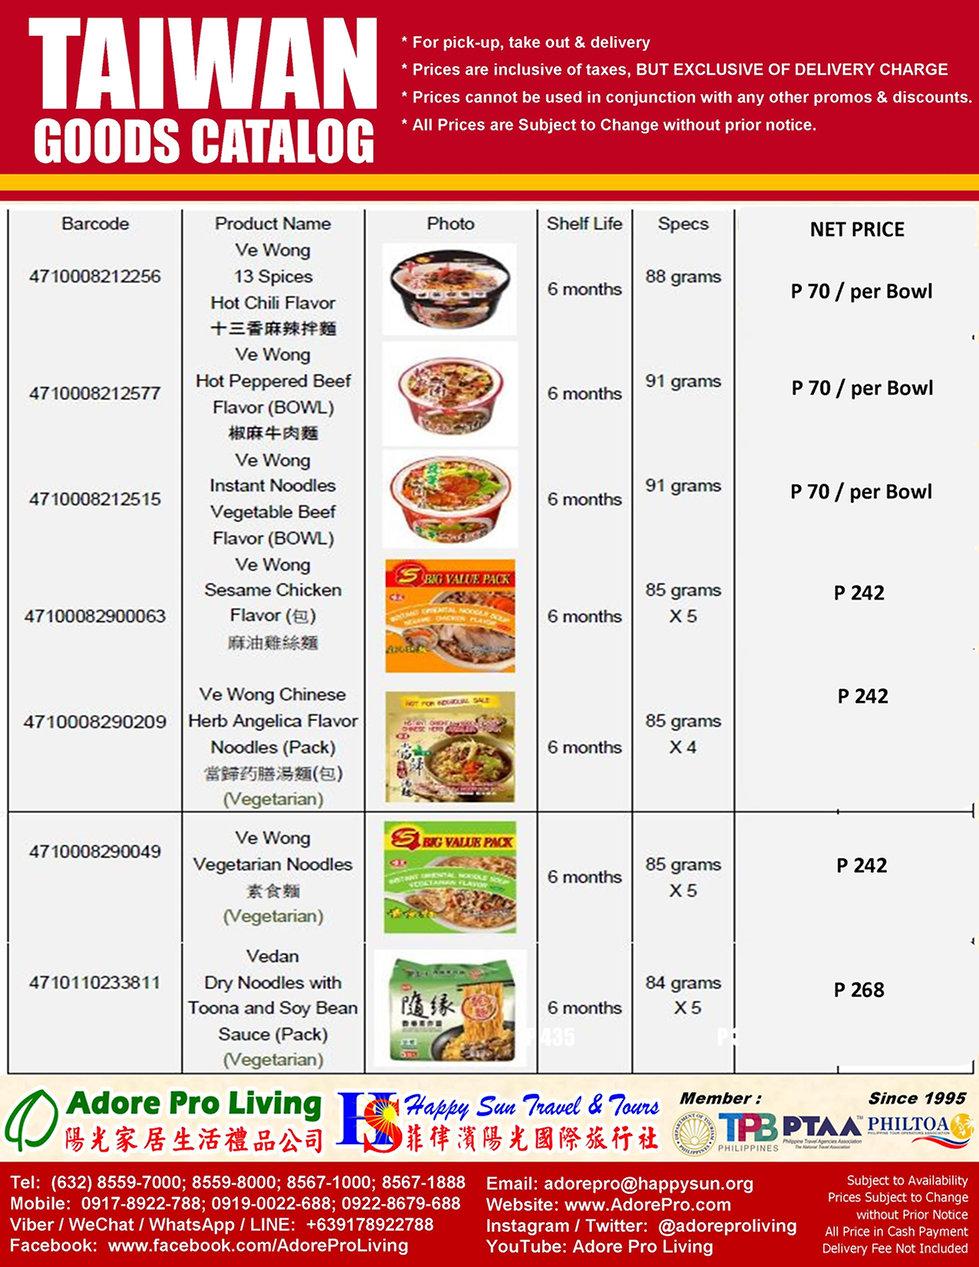 P20_Taiwan Goods Catalog_202009119.jpg